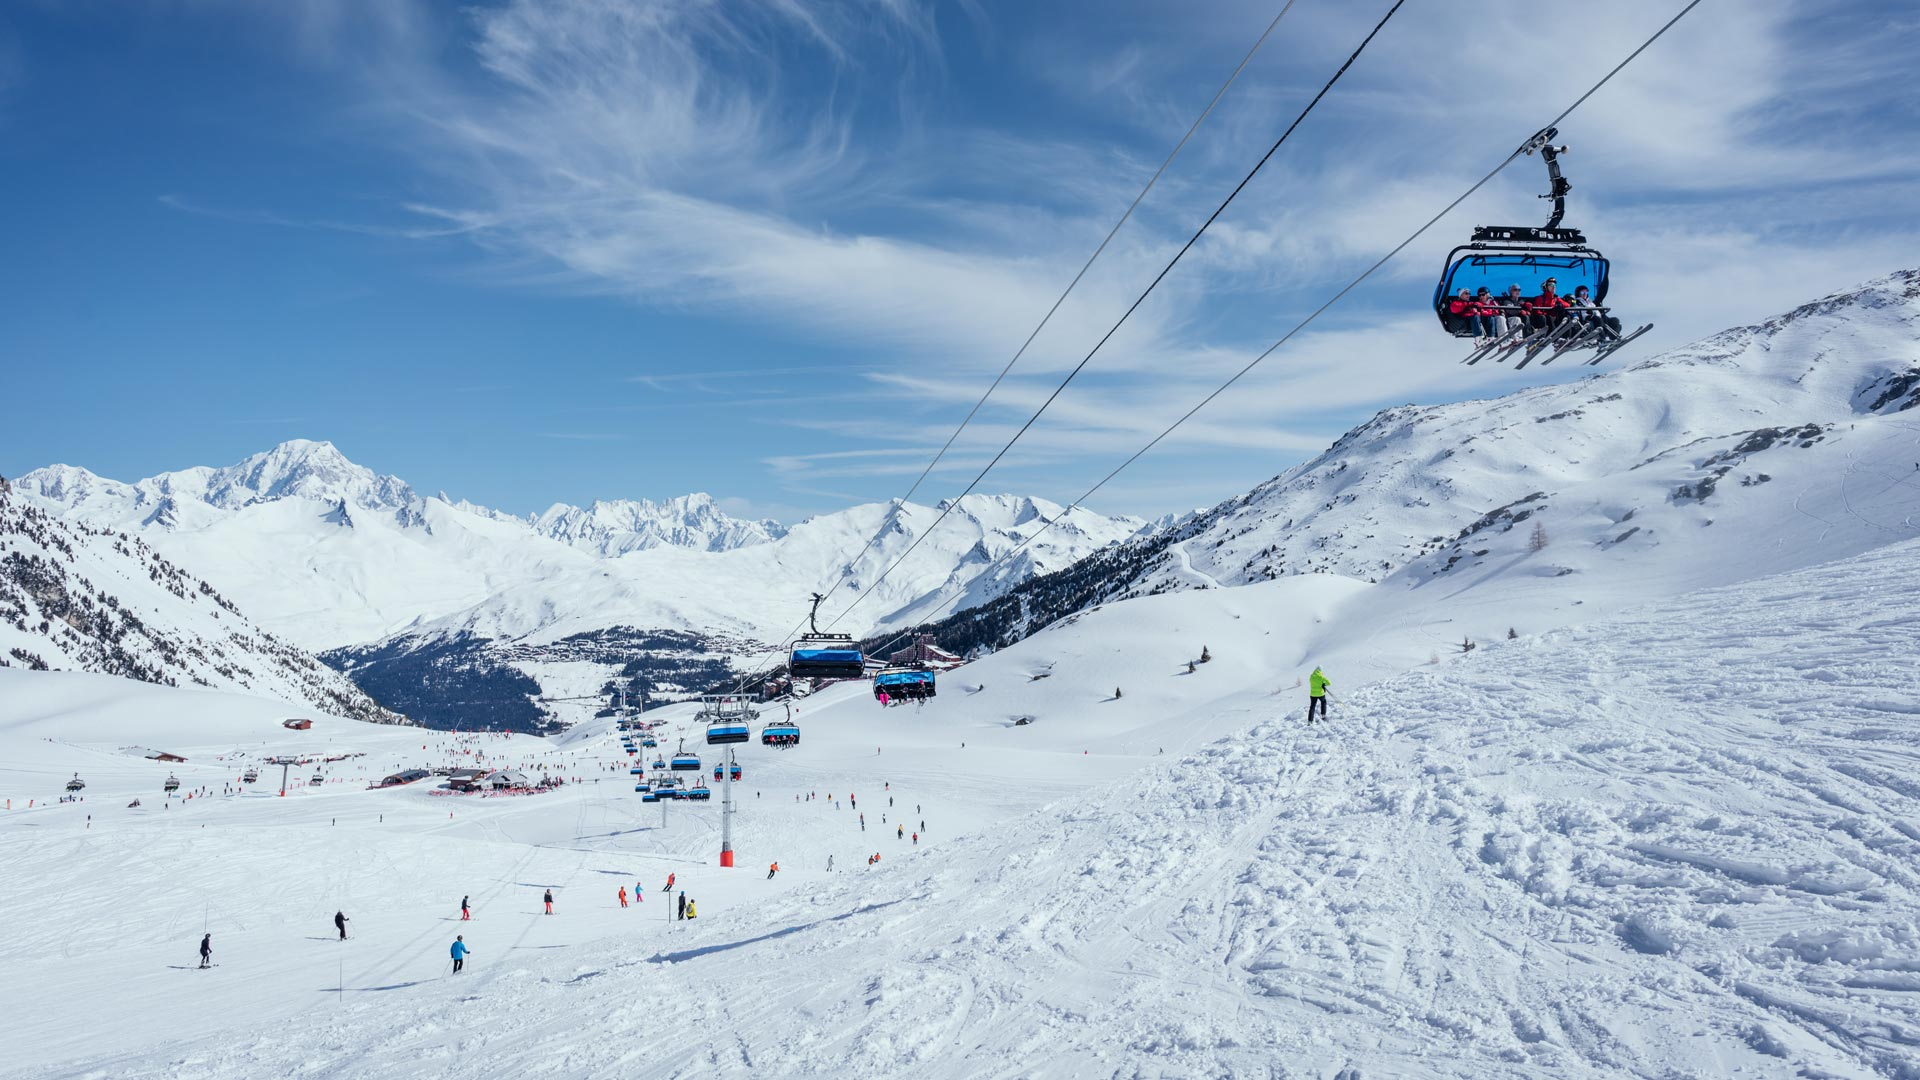 Skiing in Les Arcs with Ski Safari